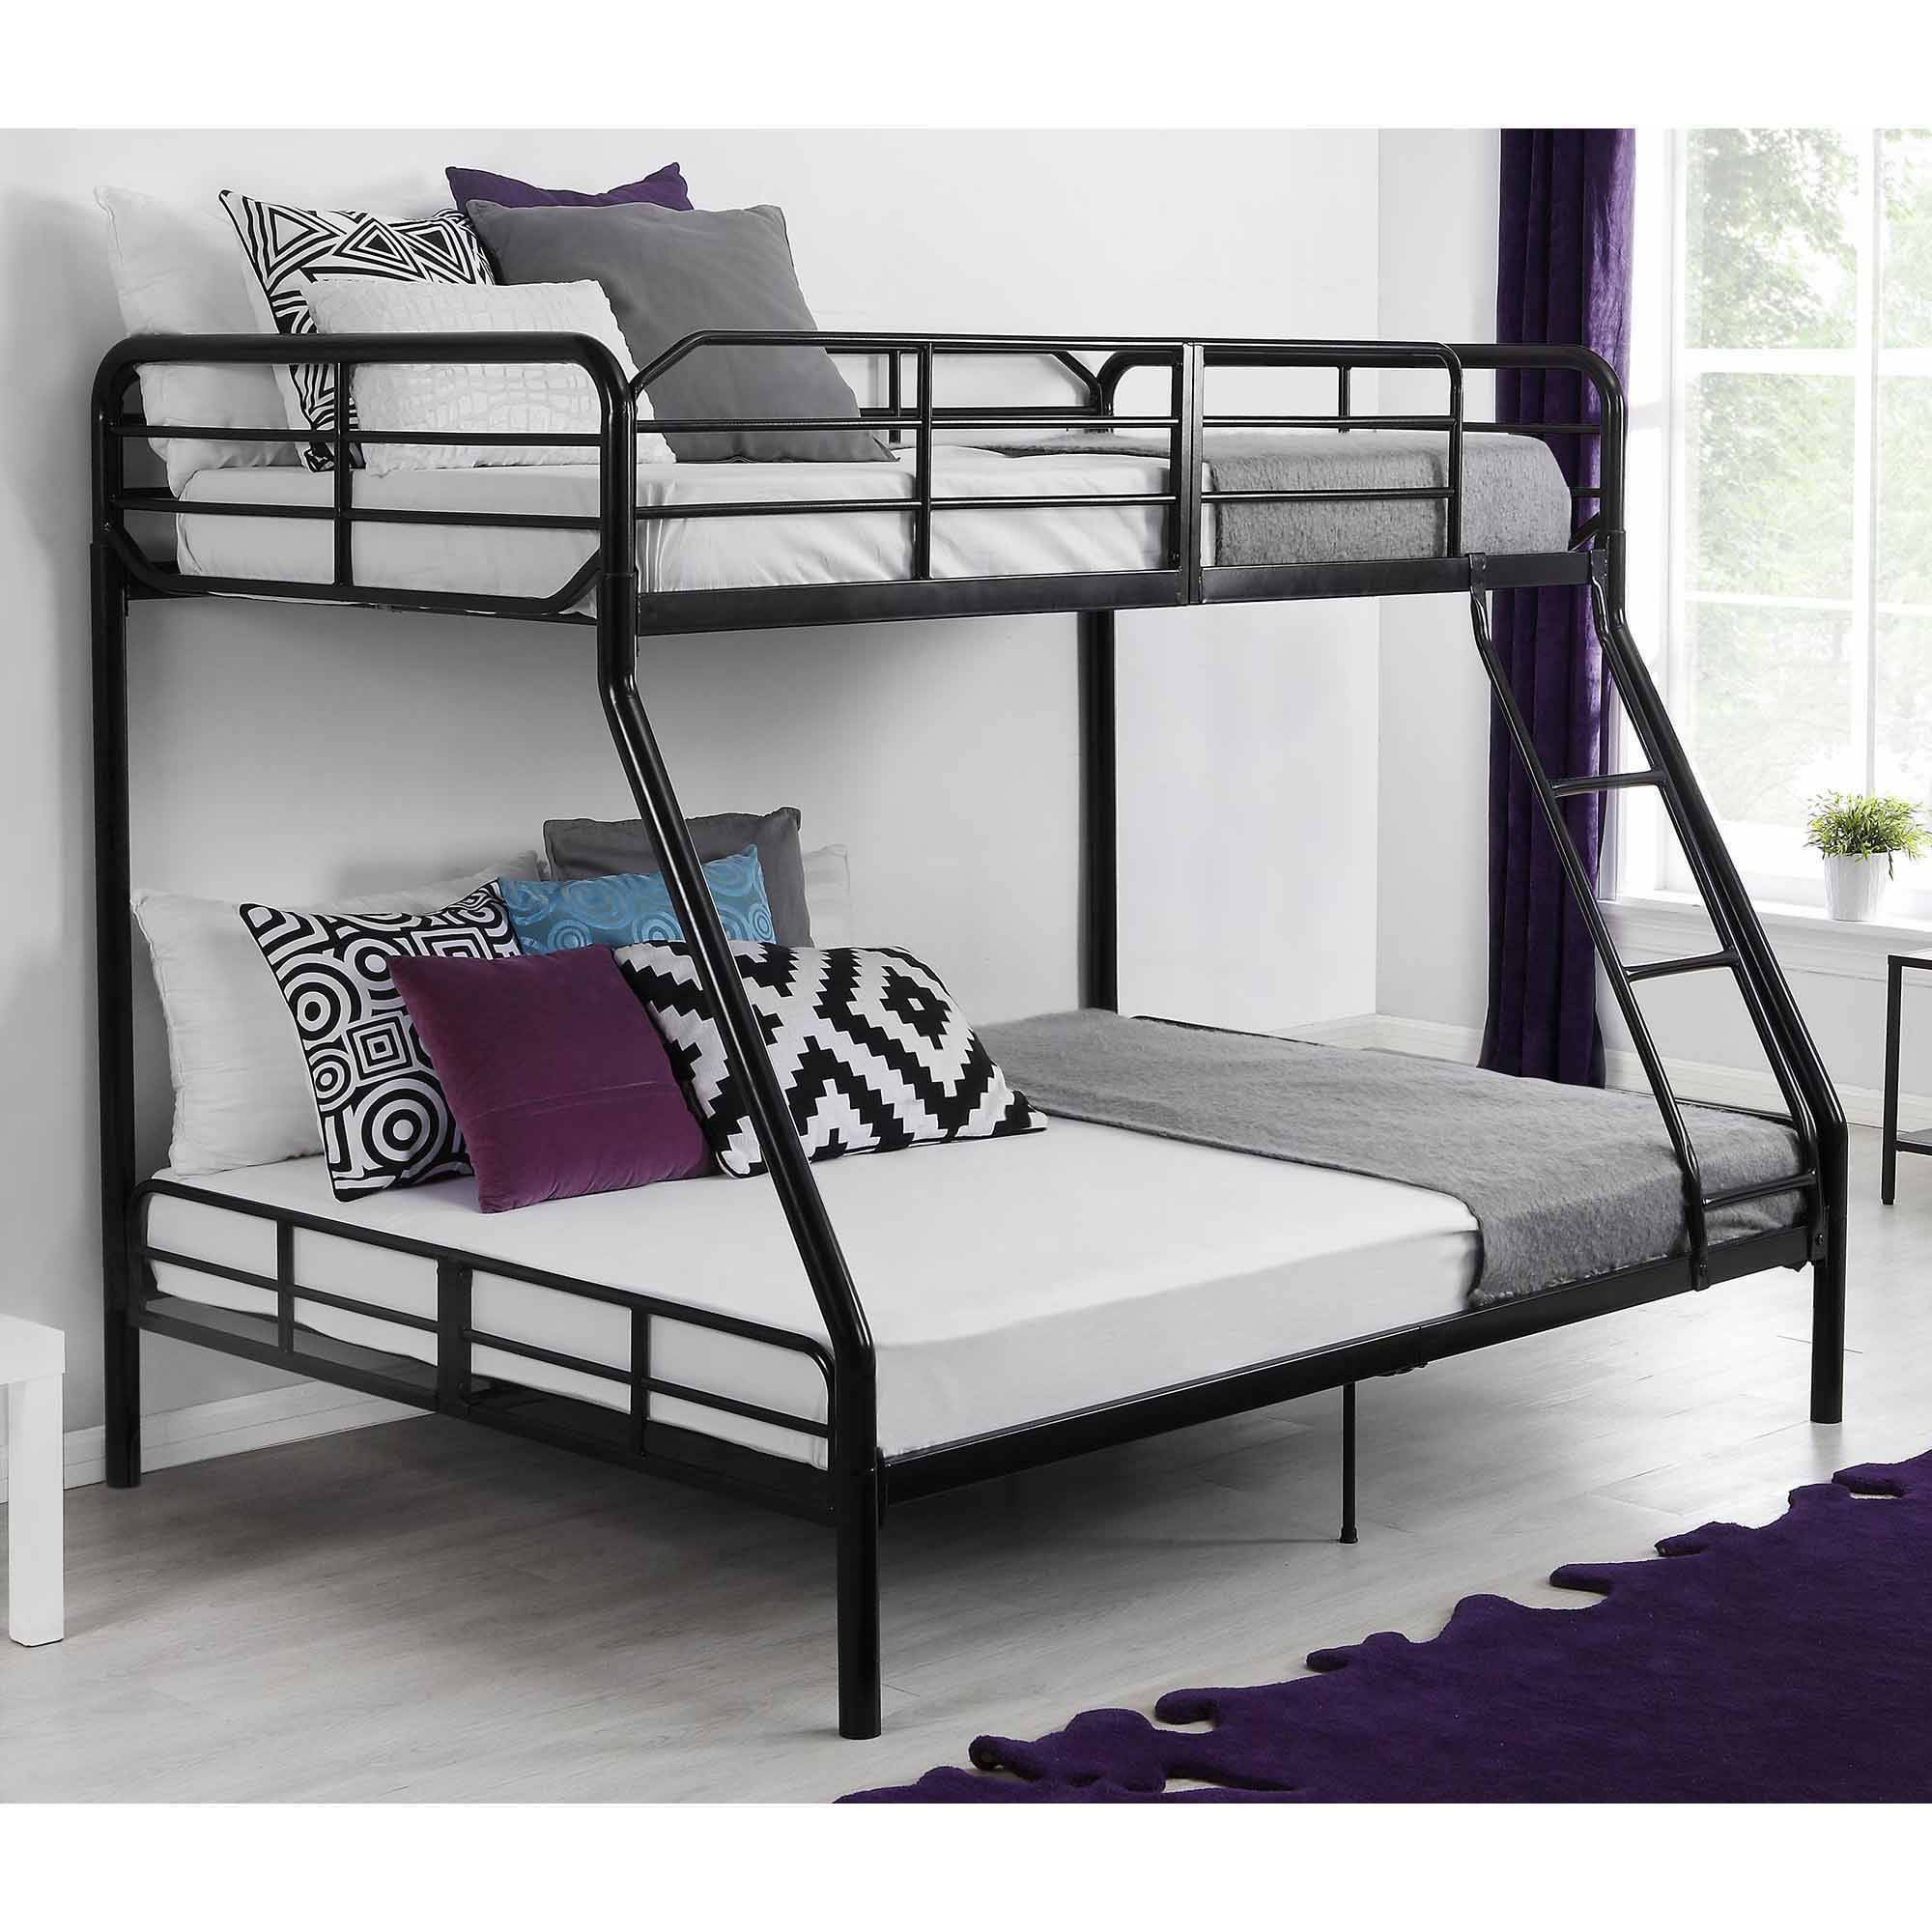 Walmart Bunk Beds For Kids